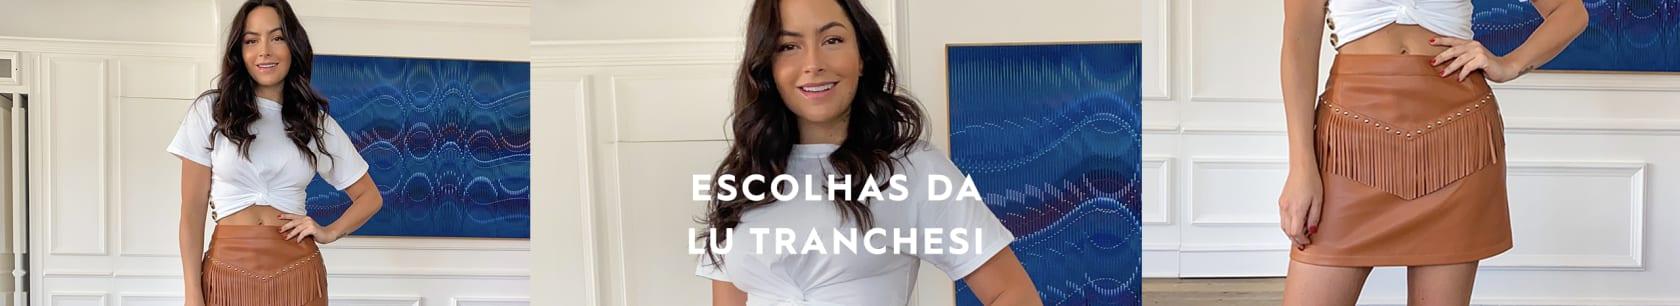 LOOKS DA LU TRANCHESI